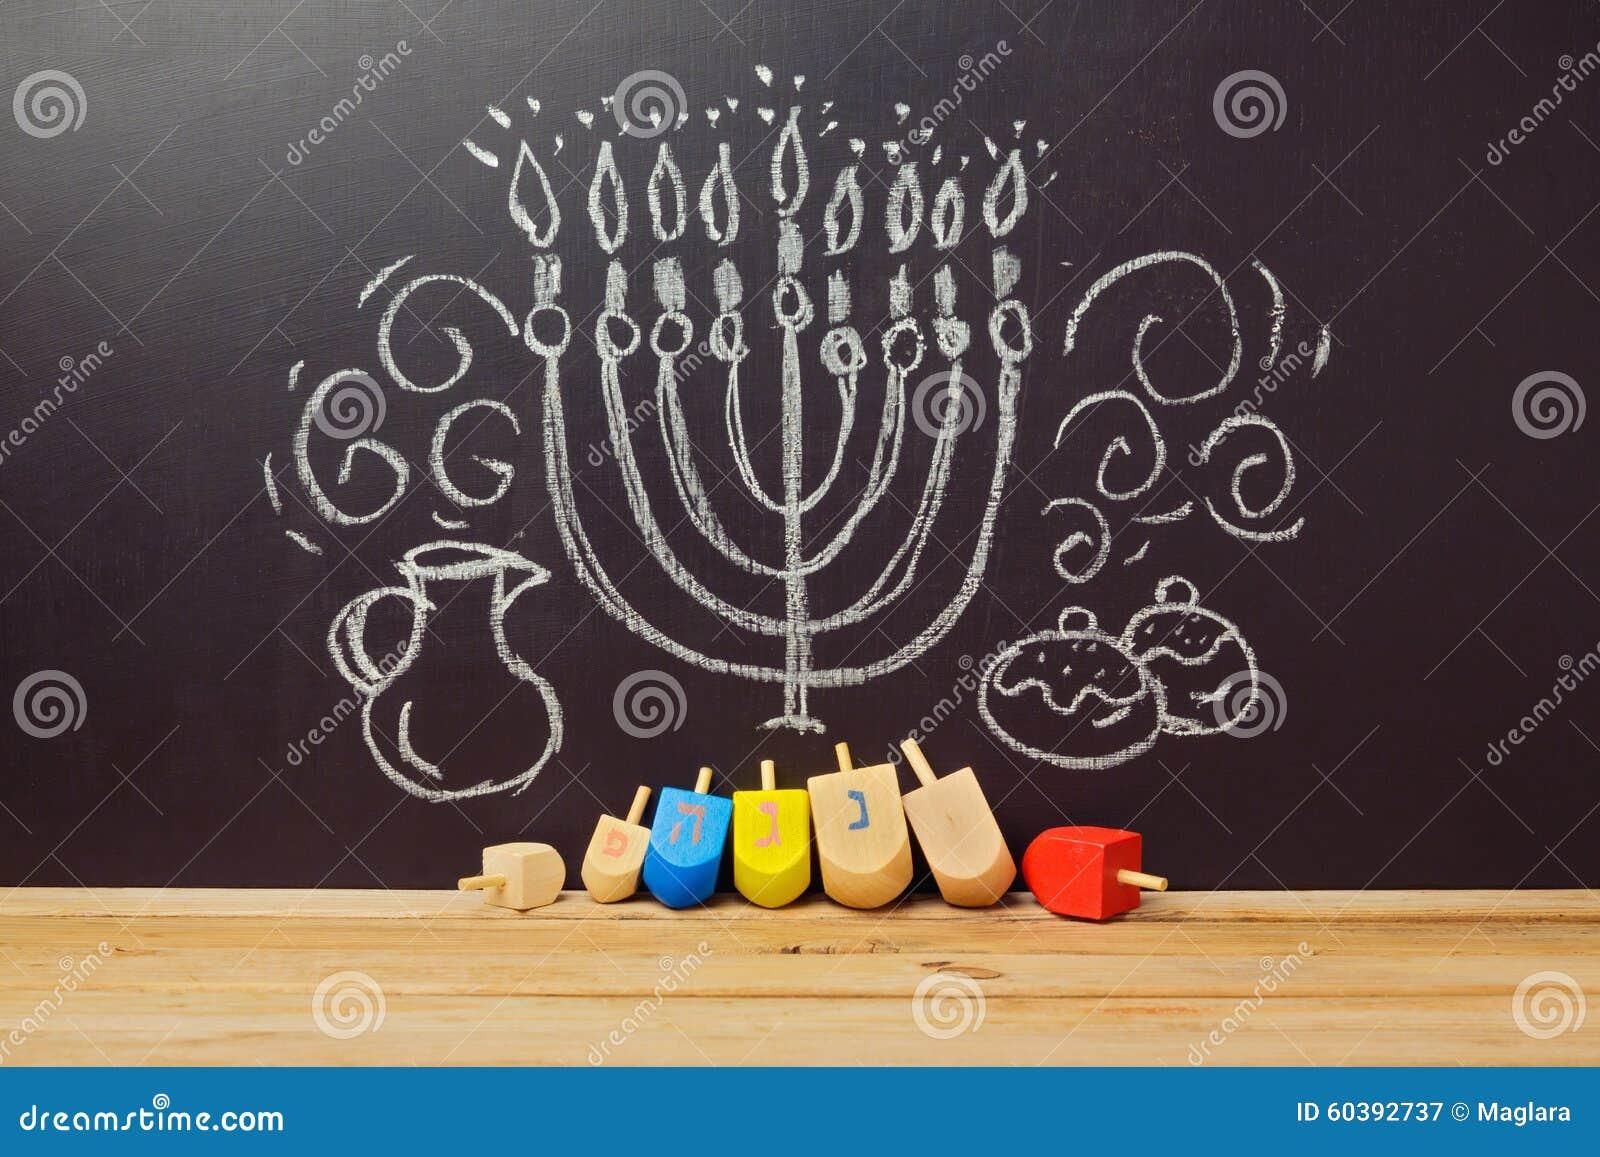 Jewish dreidel sketch stock vector. Illustration of isolated - 22337704